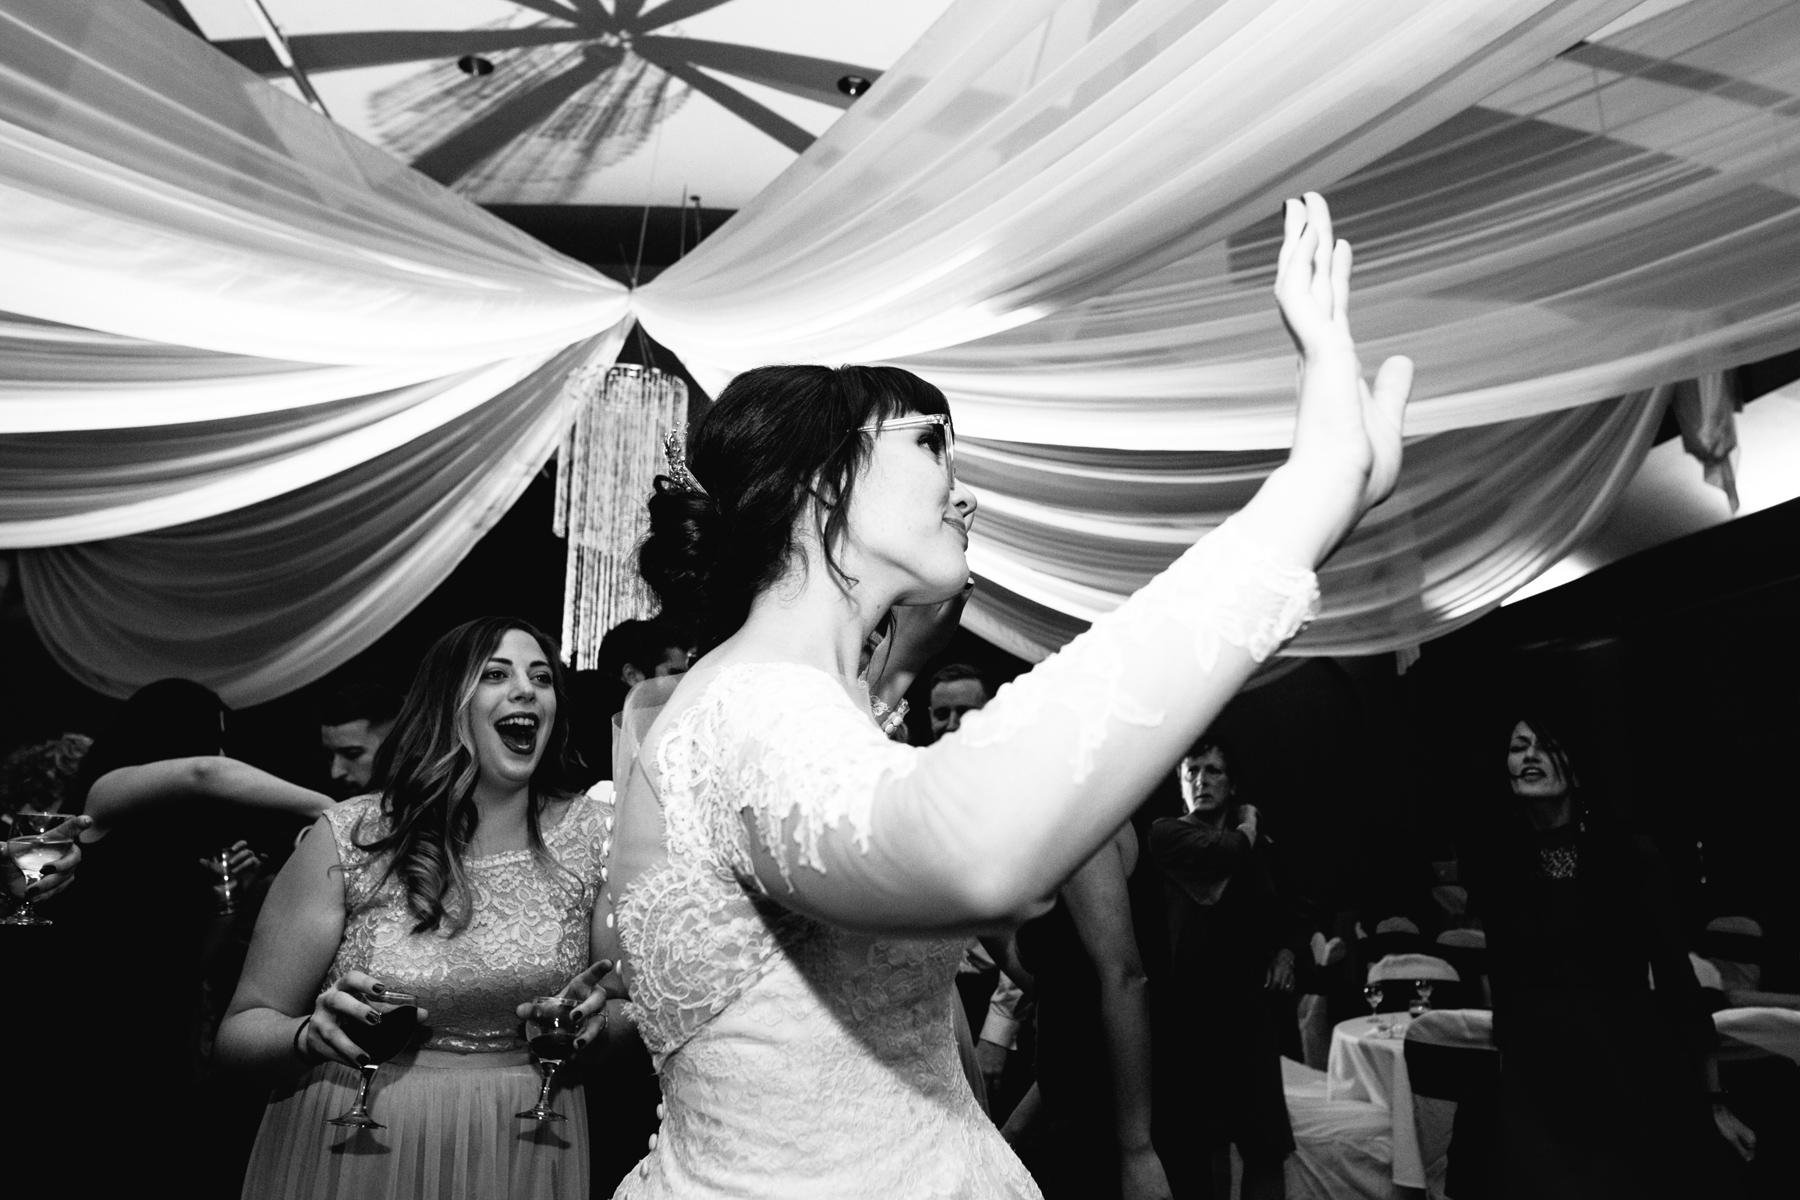 075-fredericton-wedding-photographer-kandisebrown-em2017